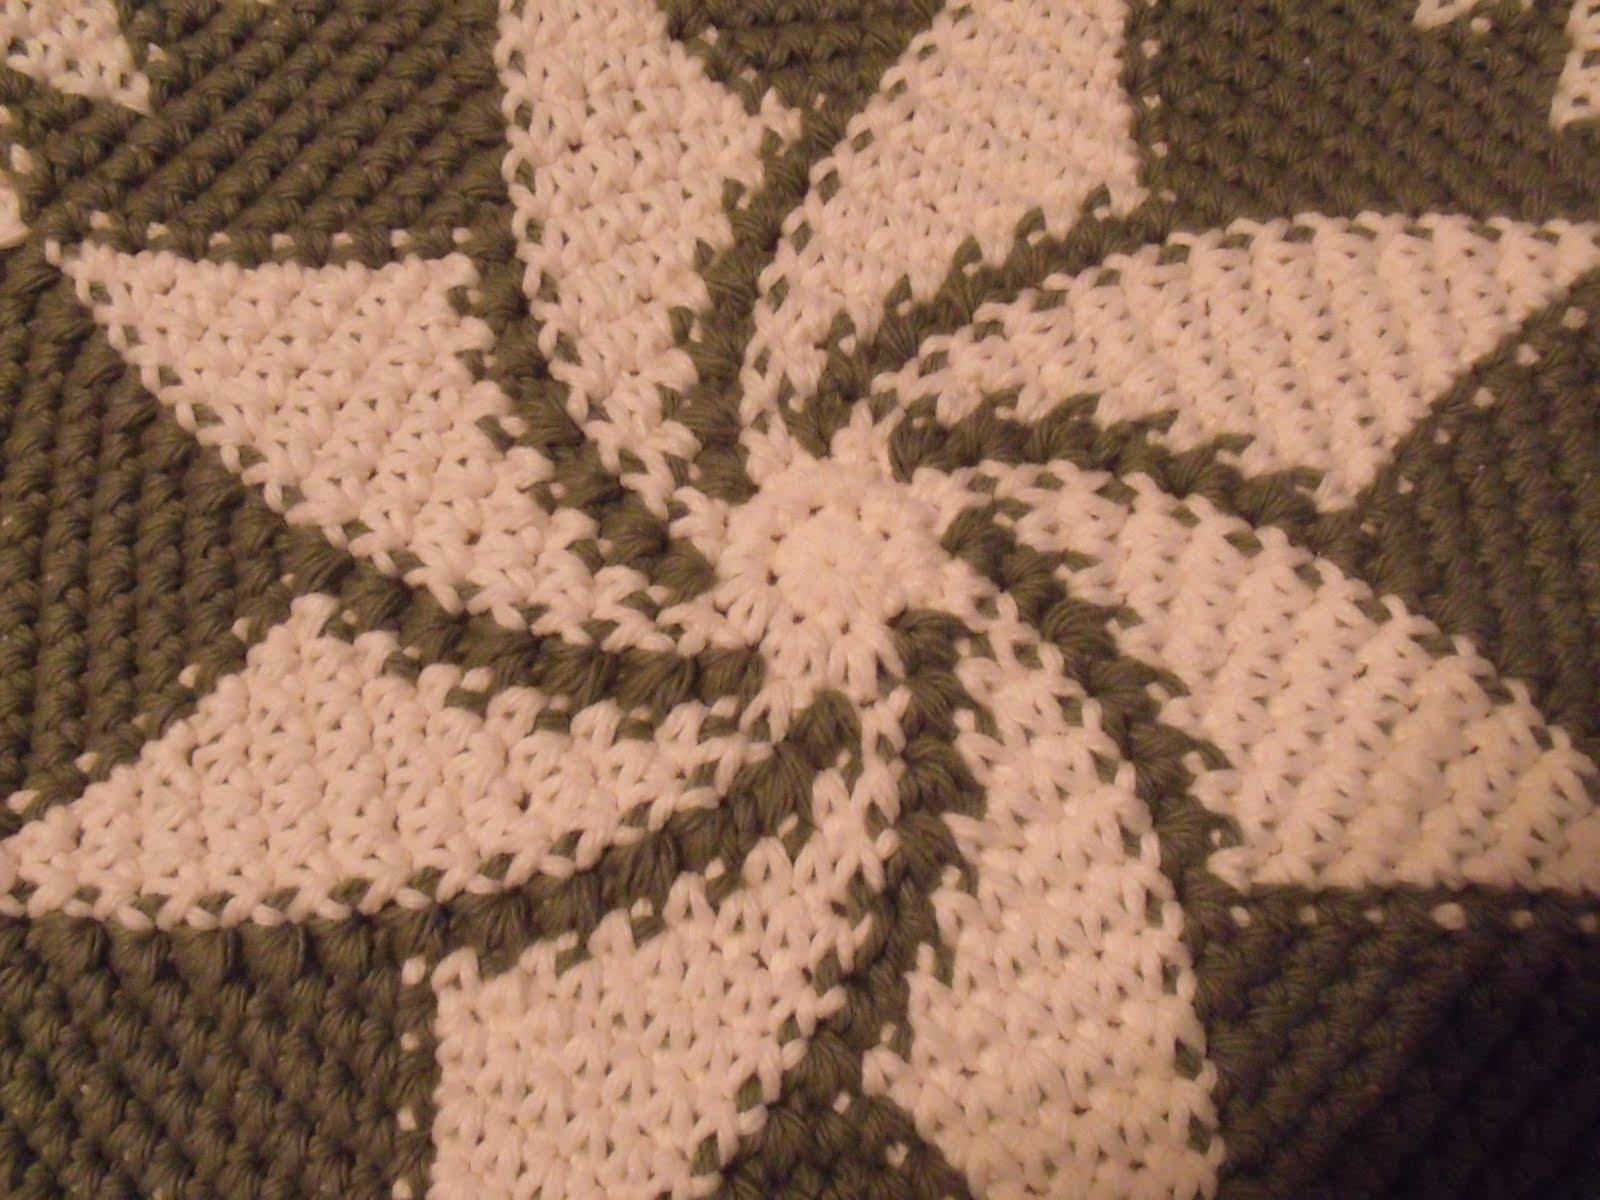 Tapestry Crochet : MIRASOLACE: Tapestry Crochet